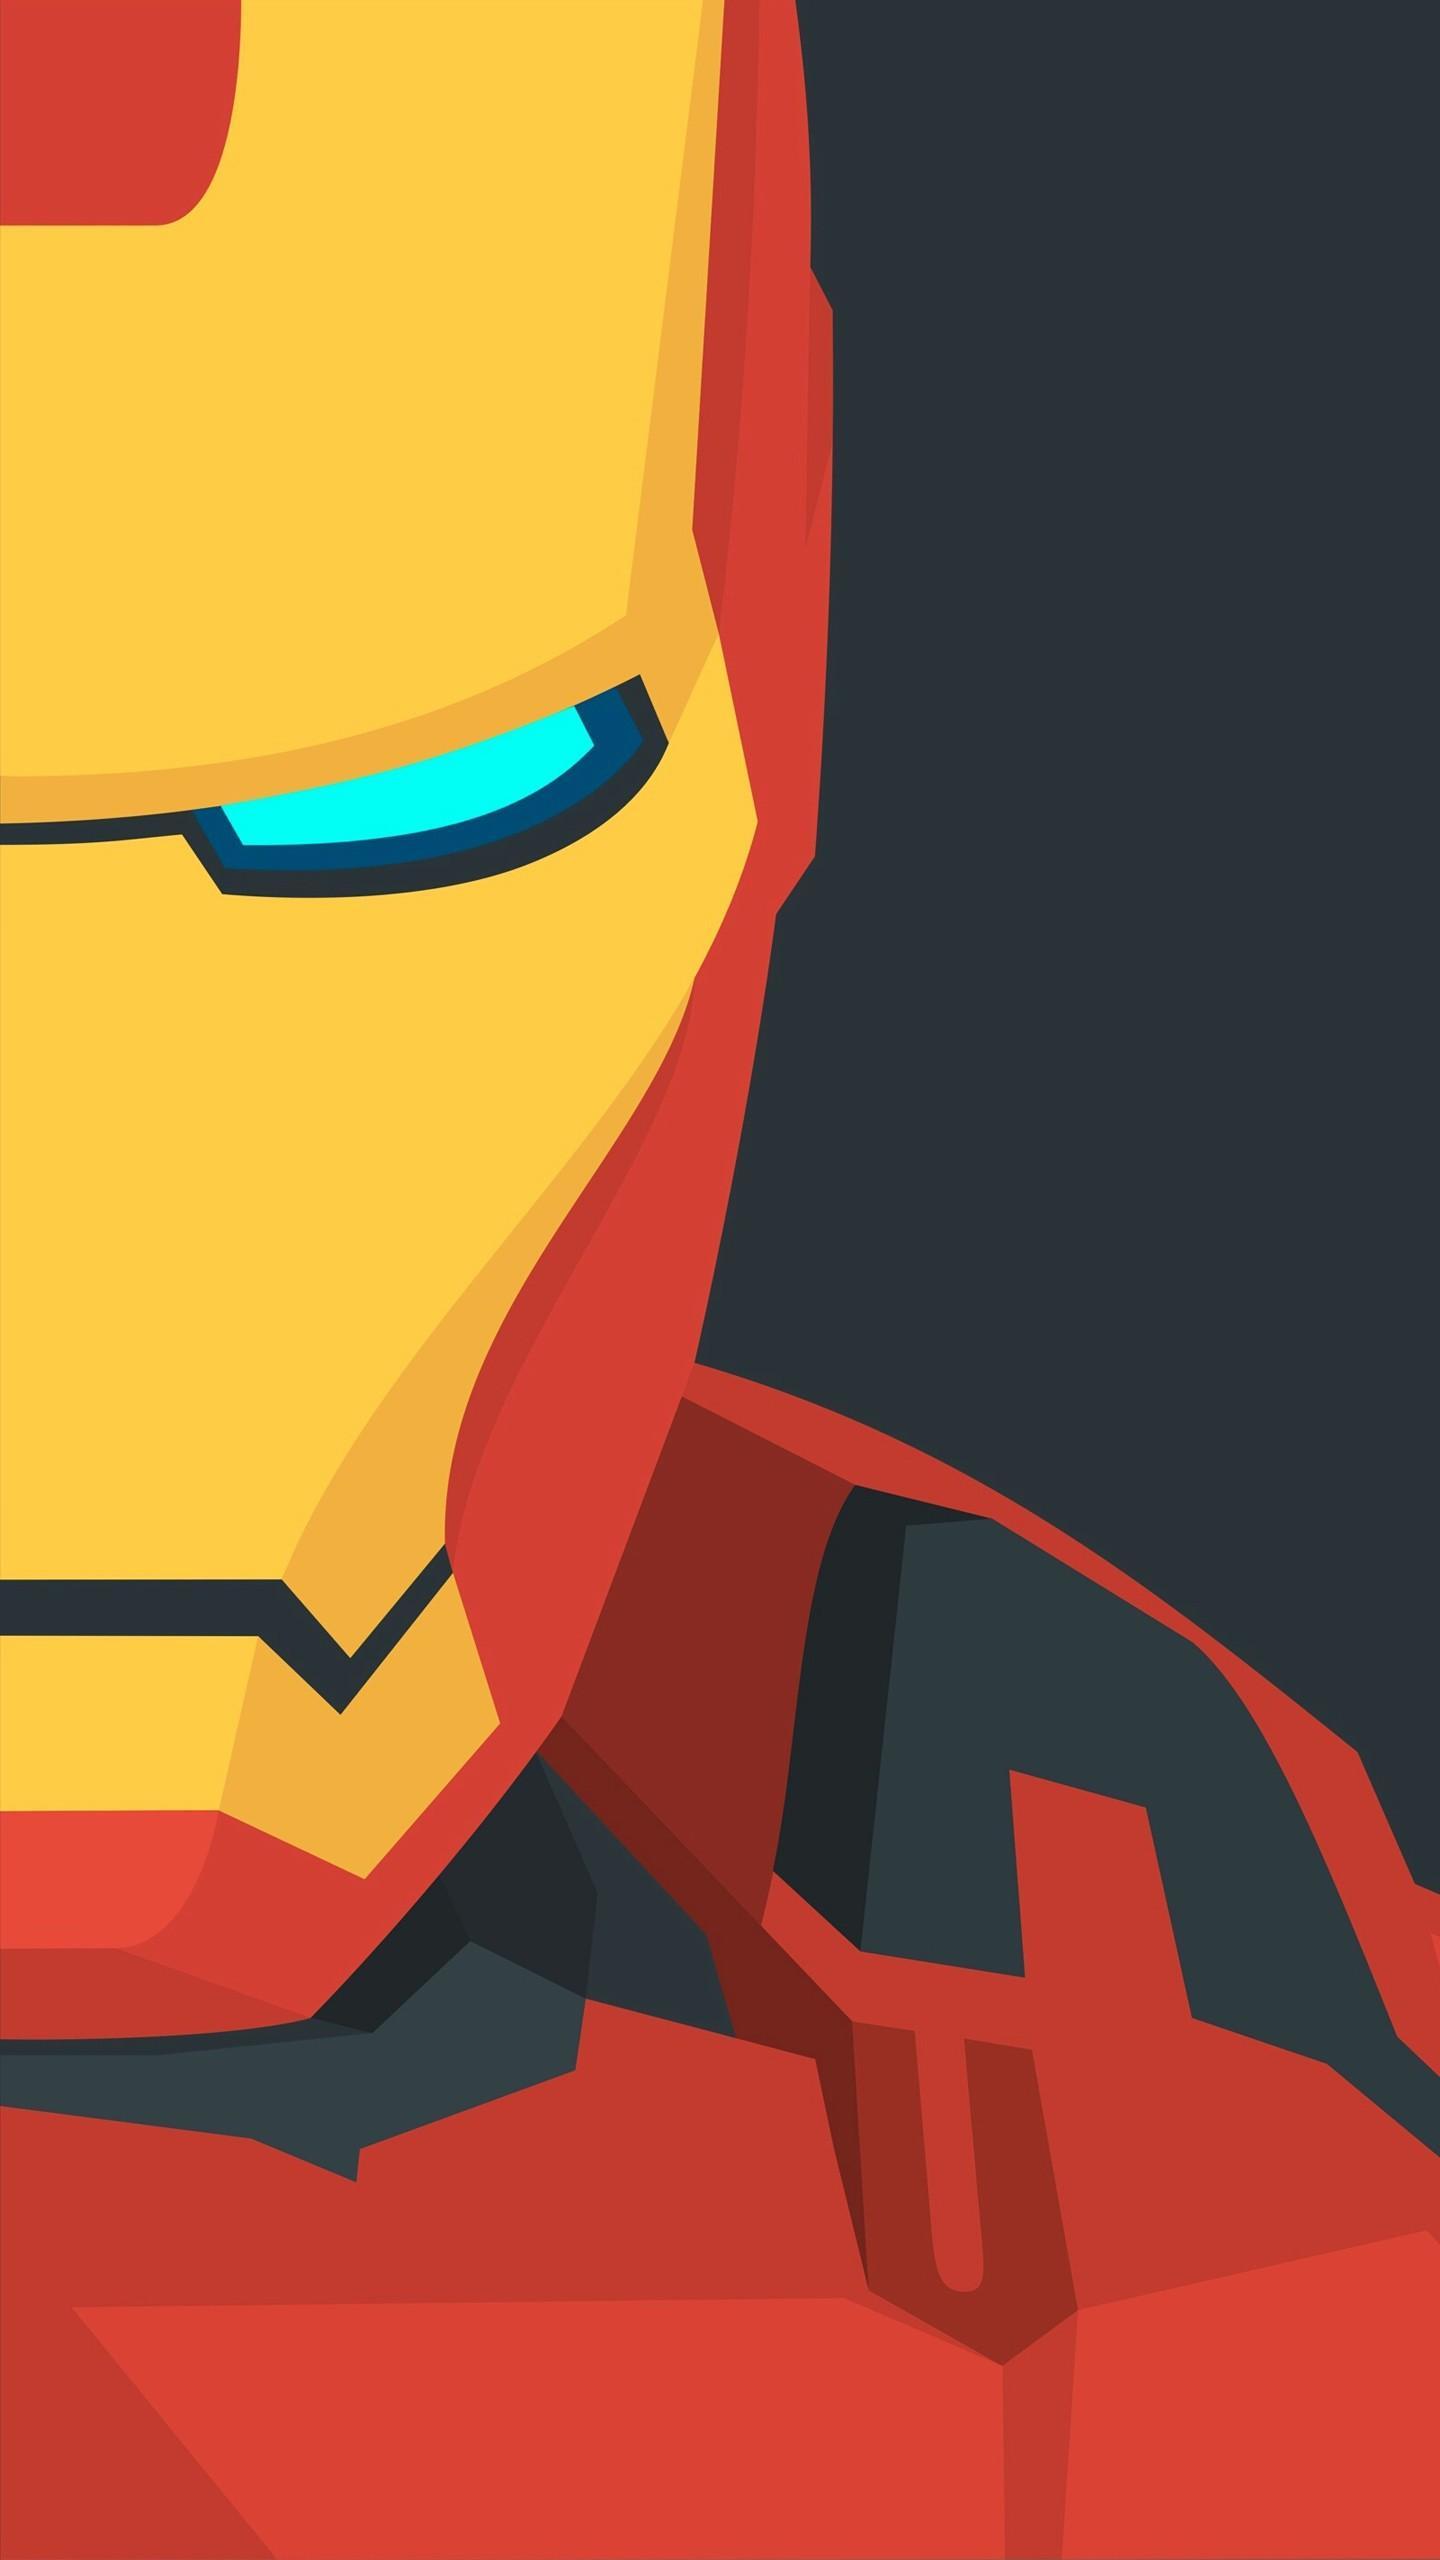 Iron Man Minimalist Wallpapers - Wallpaper Cave